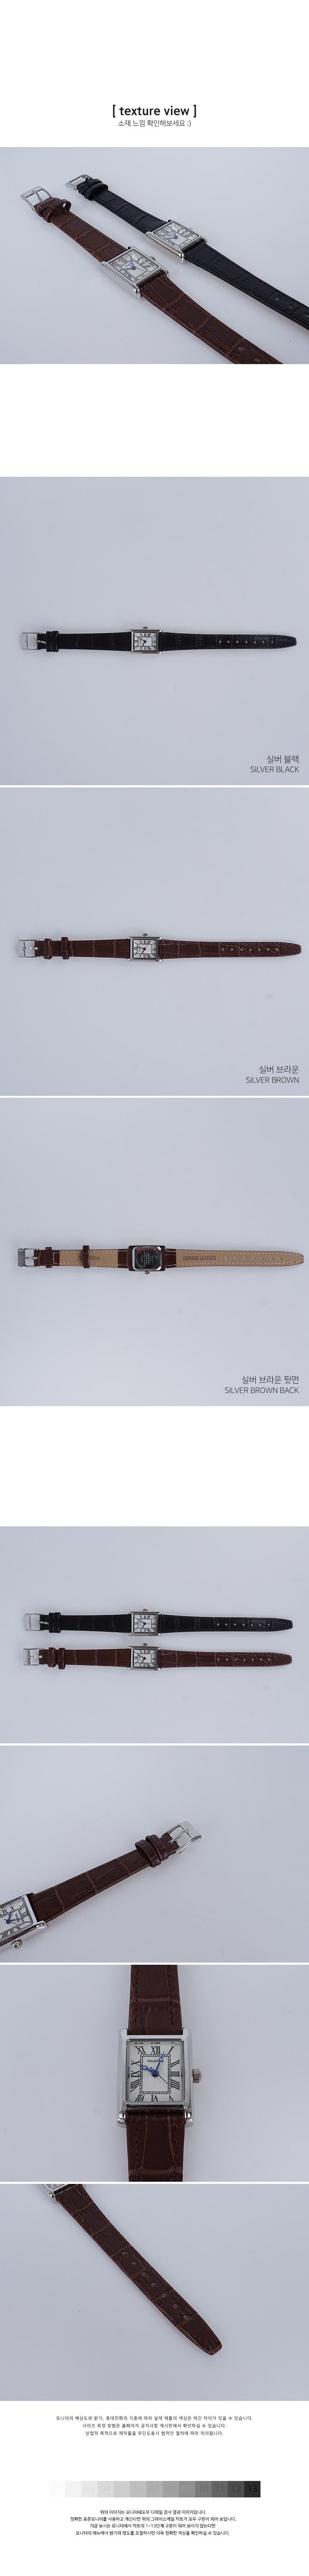 Crack vintage watches